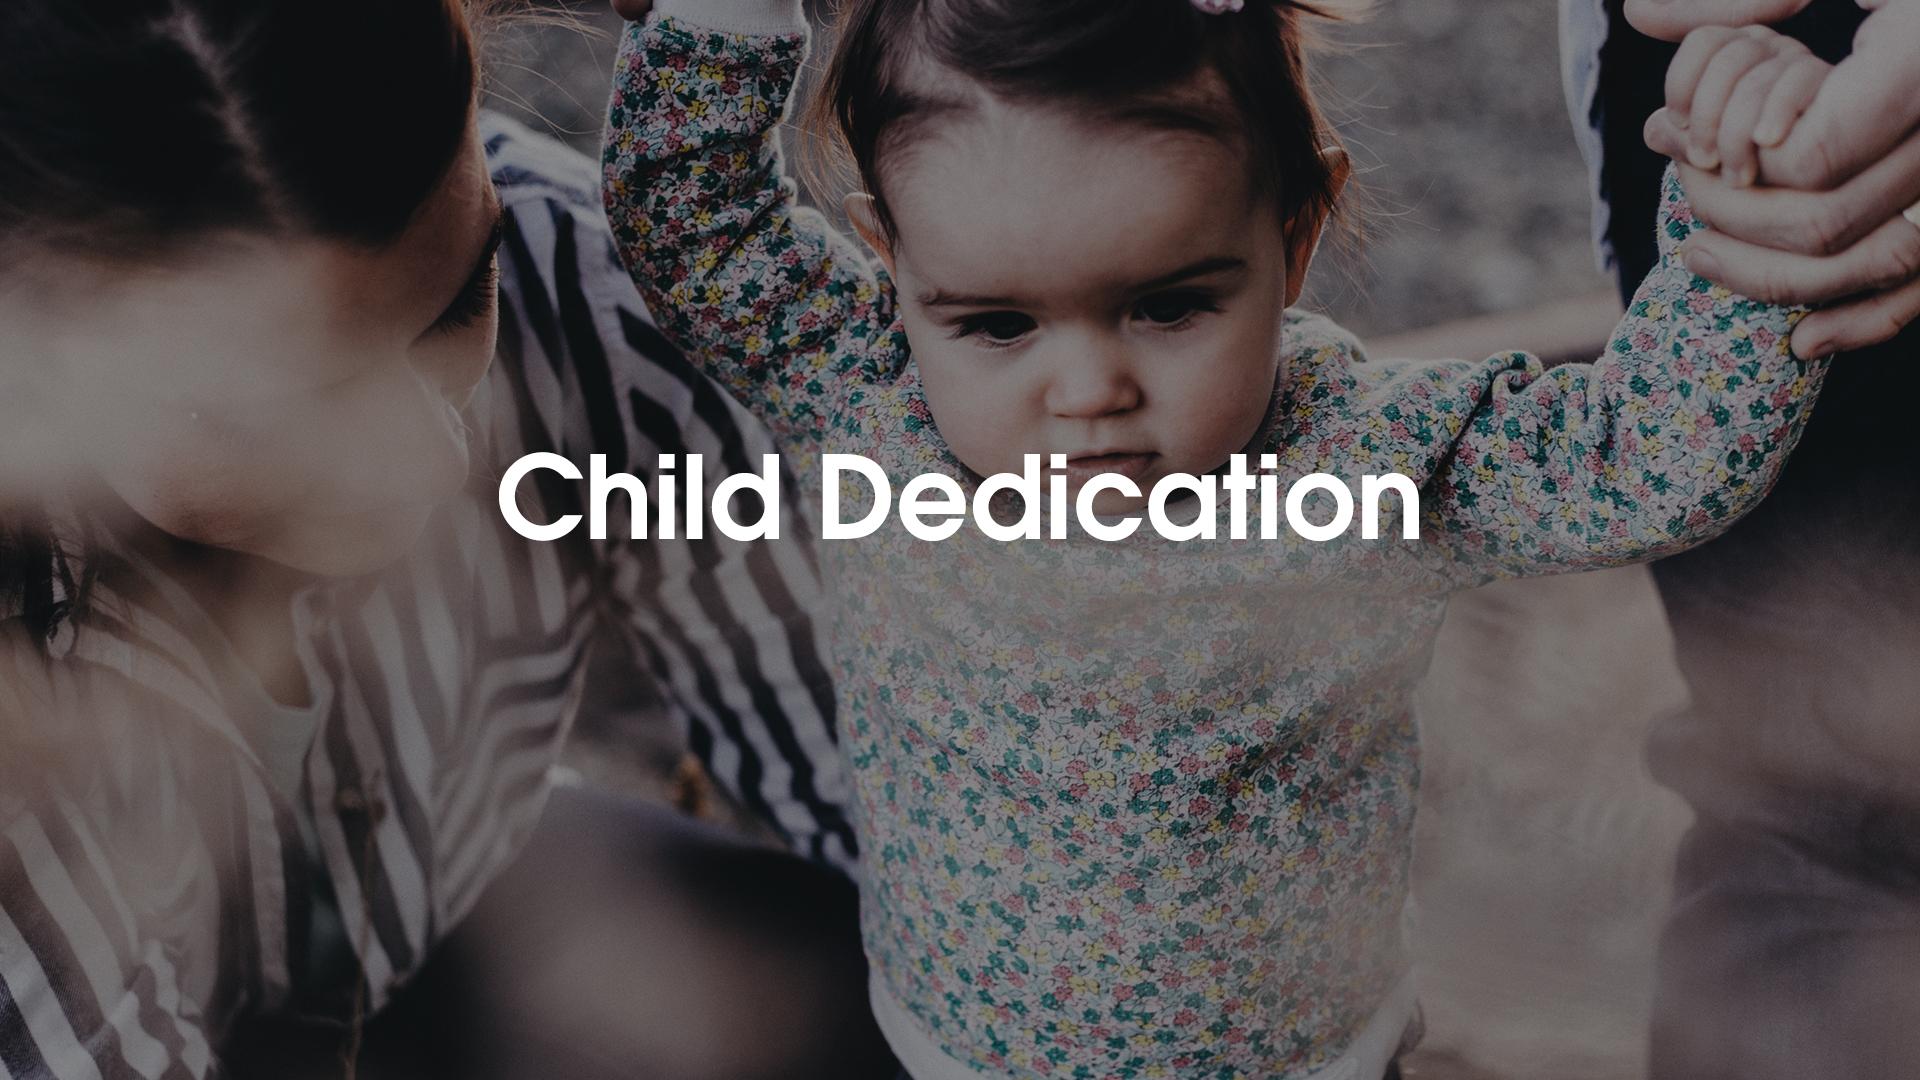 Childdedicationpic2018